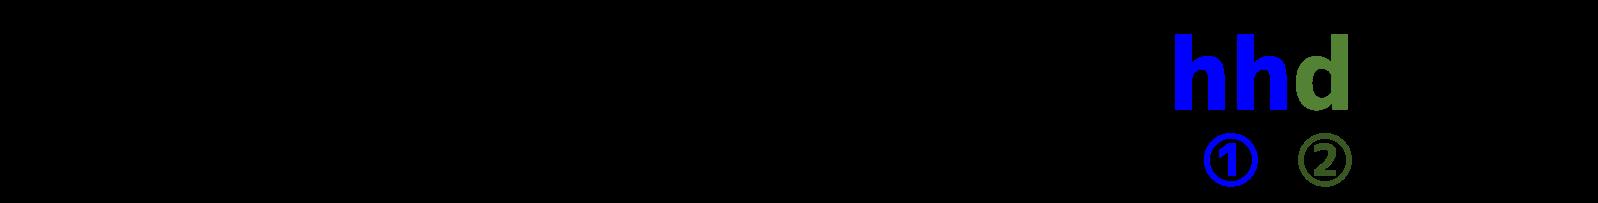 変換指定子の基本構成